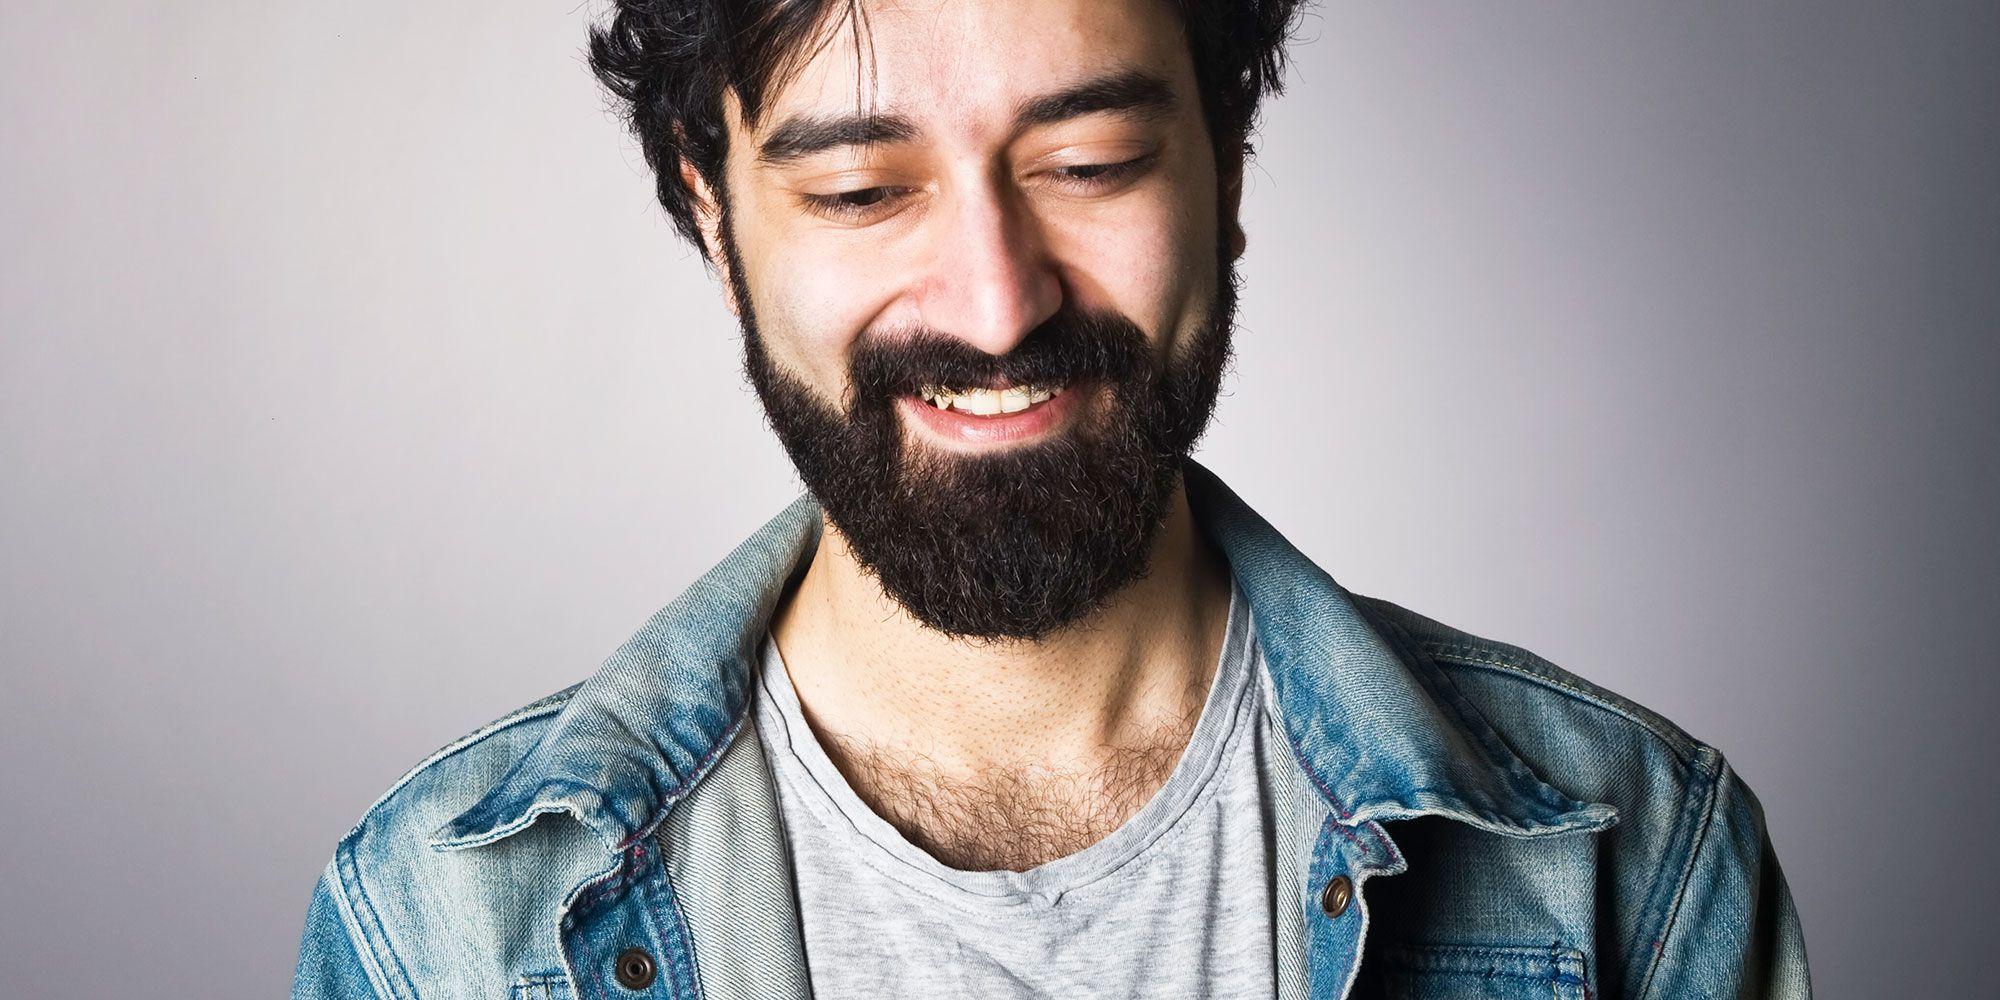 Here's How To Grow A Beard